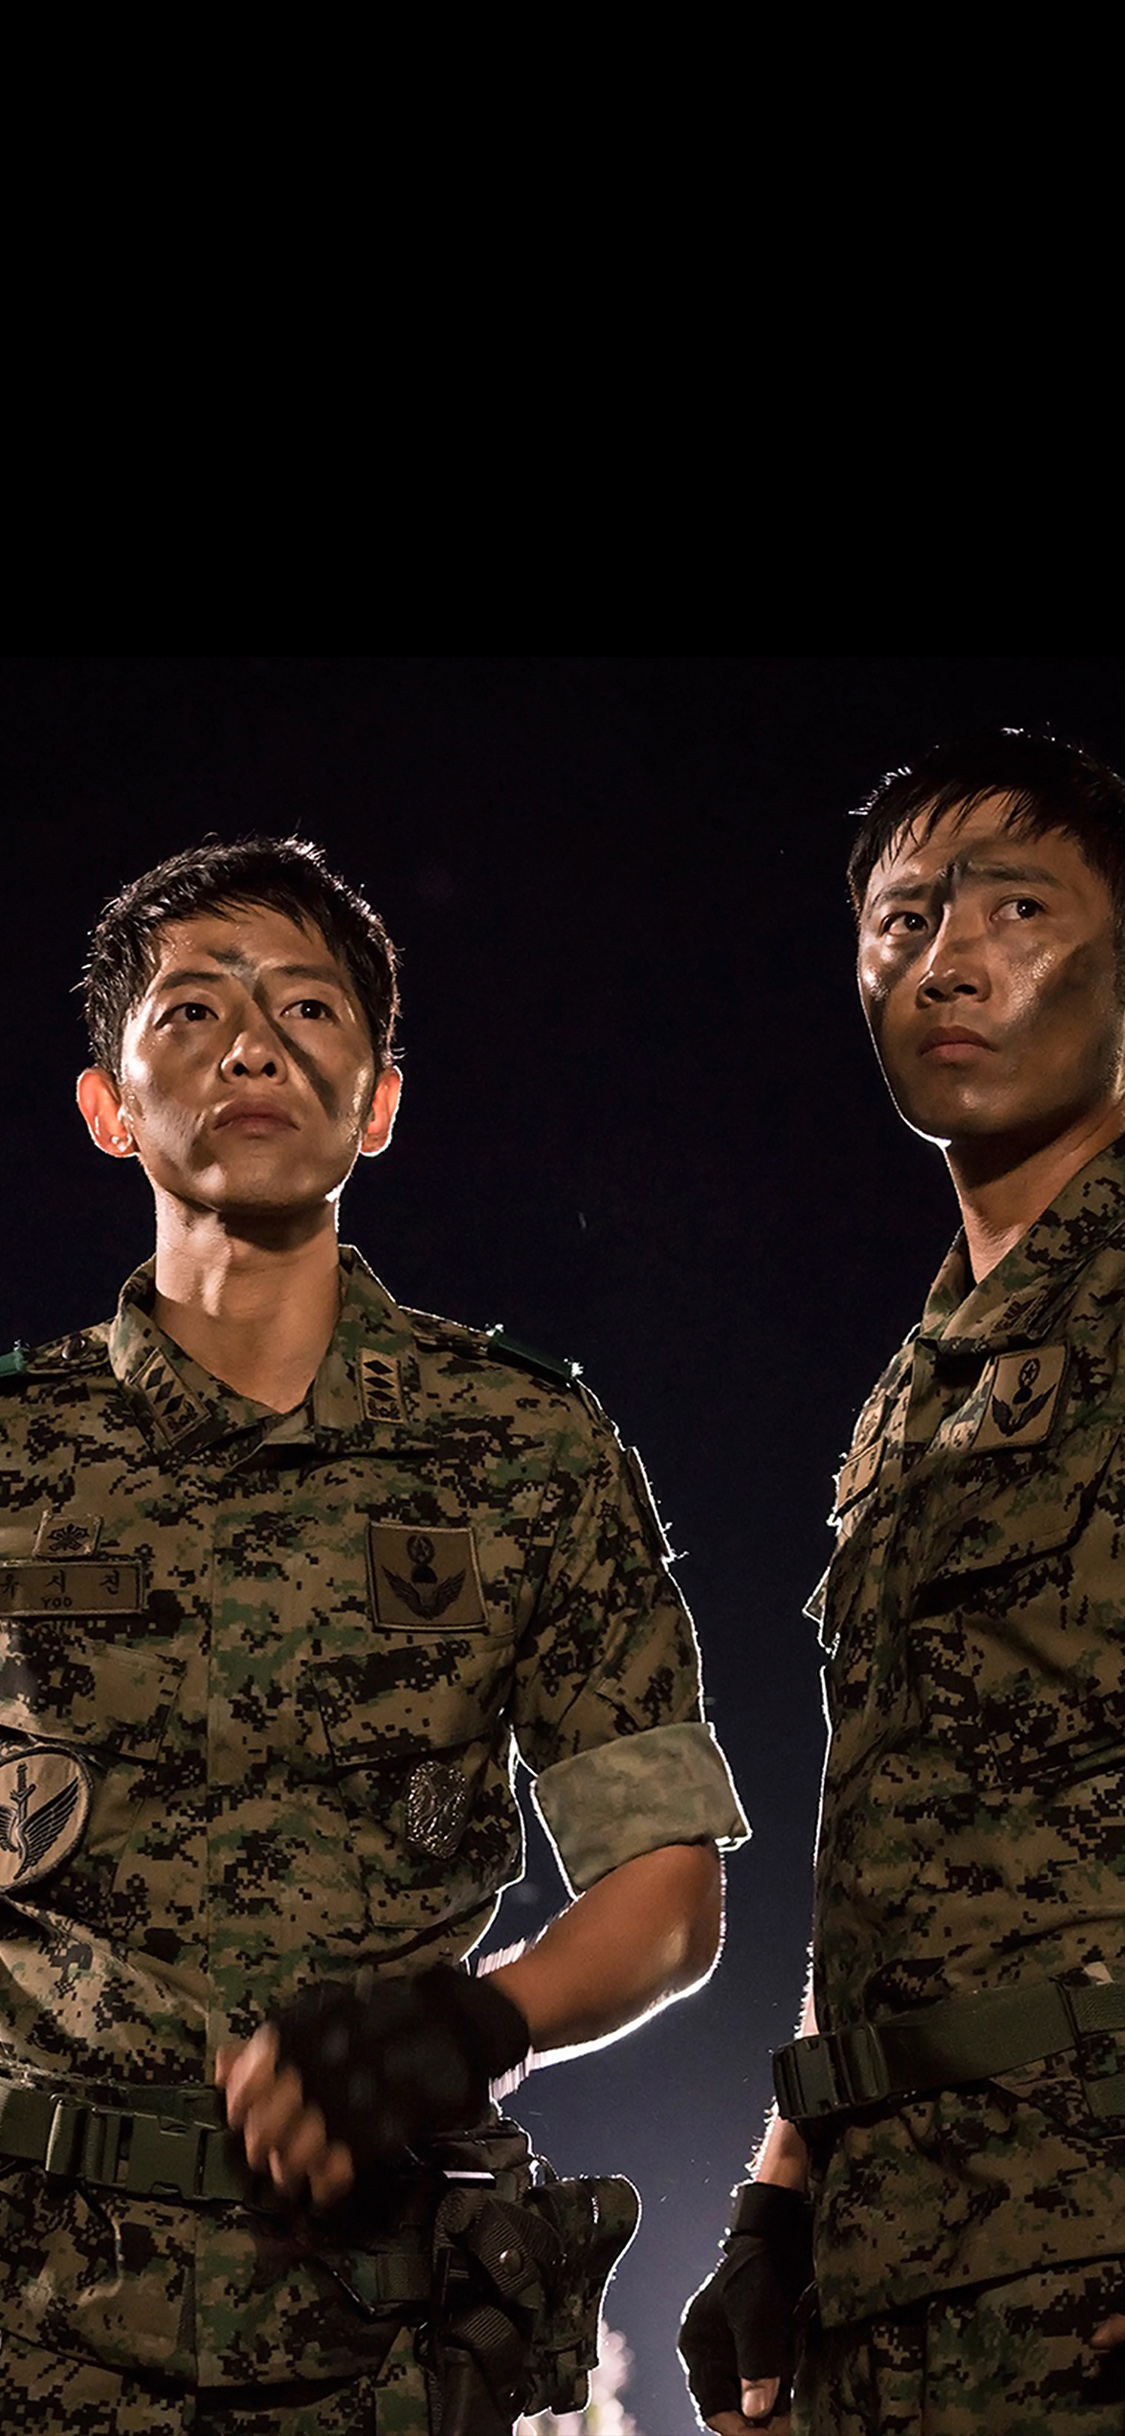 iPhoneXpapers.com-Apple-iPhone-wallpaper-hi05-kpop-sun-song-joonggi-military-descendants-of-the-sun